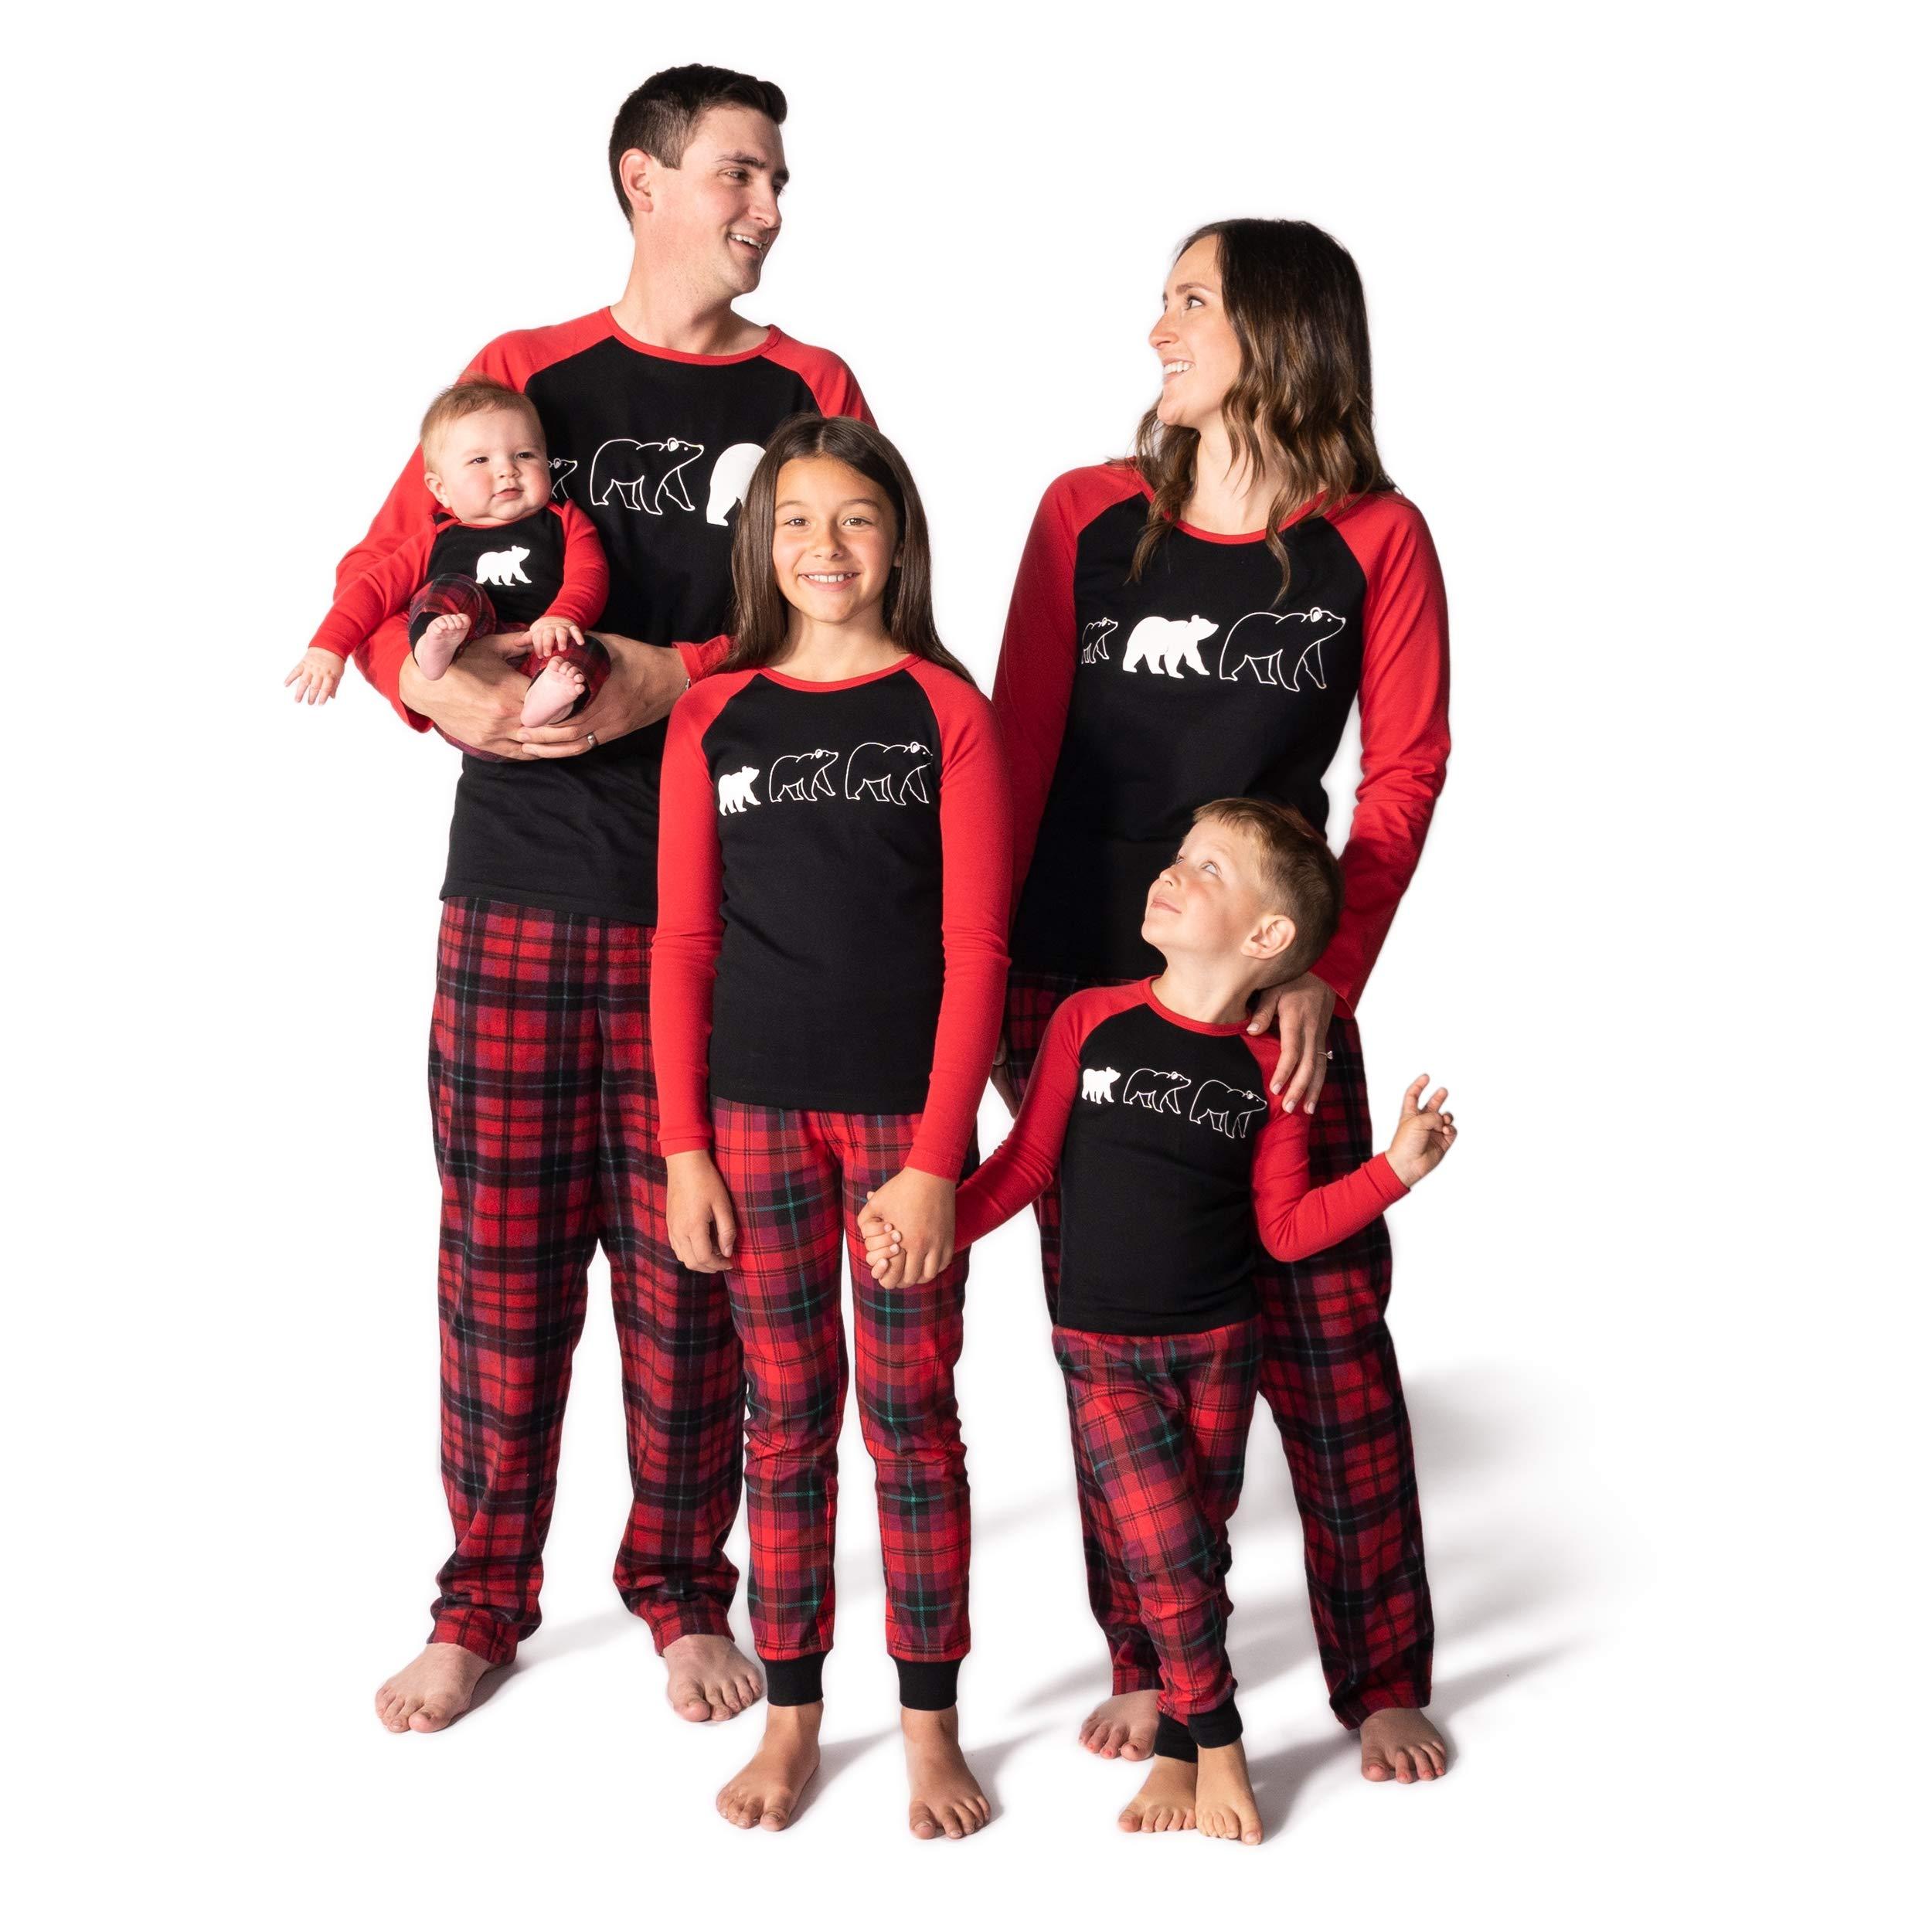 Yaffi Family Matching Christmas Striped Pajamas Set Sleepwear for Dad Mom Baby Kids